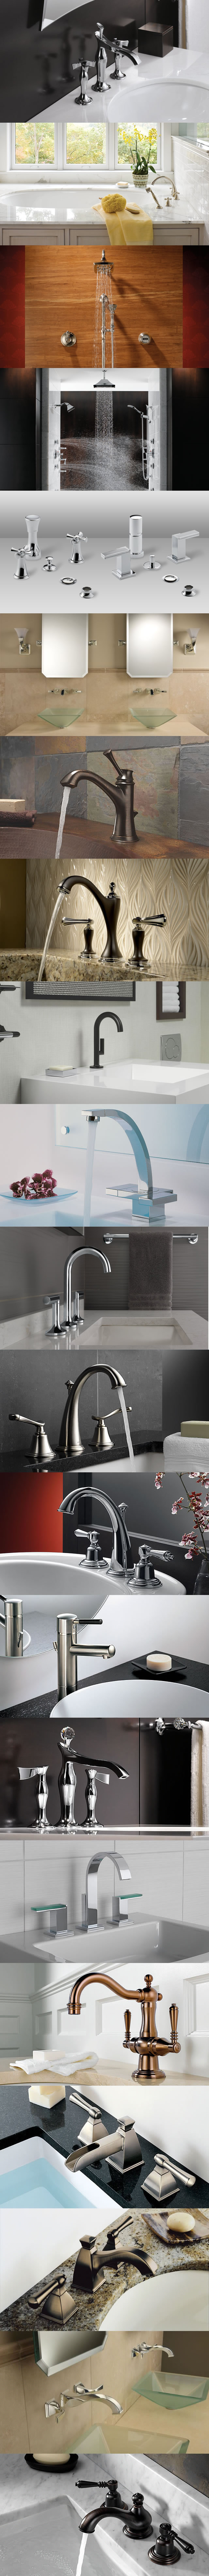 bath-sprite